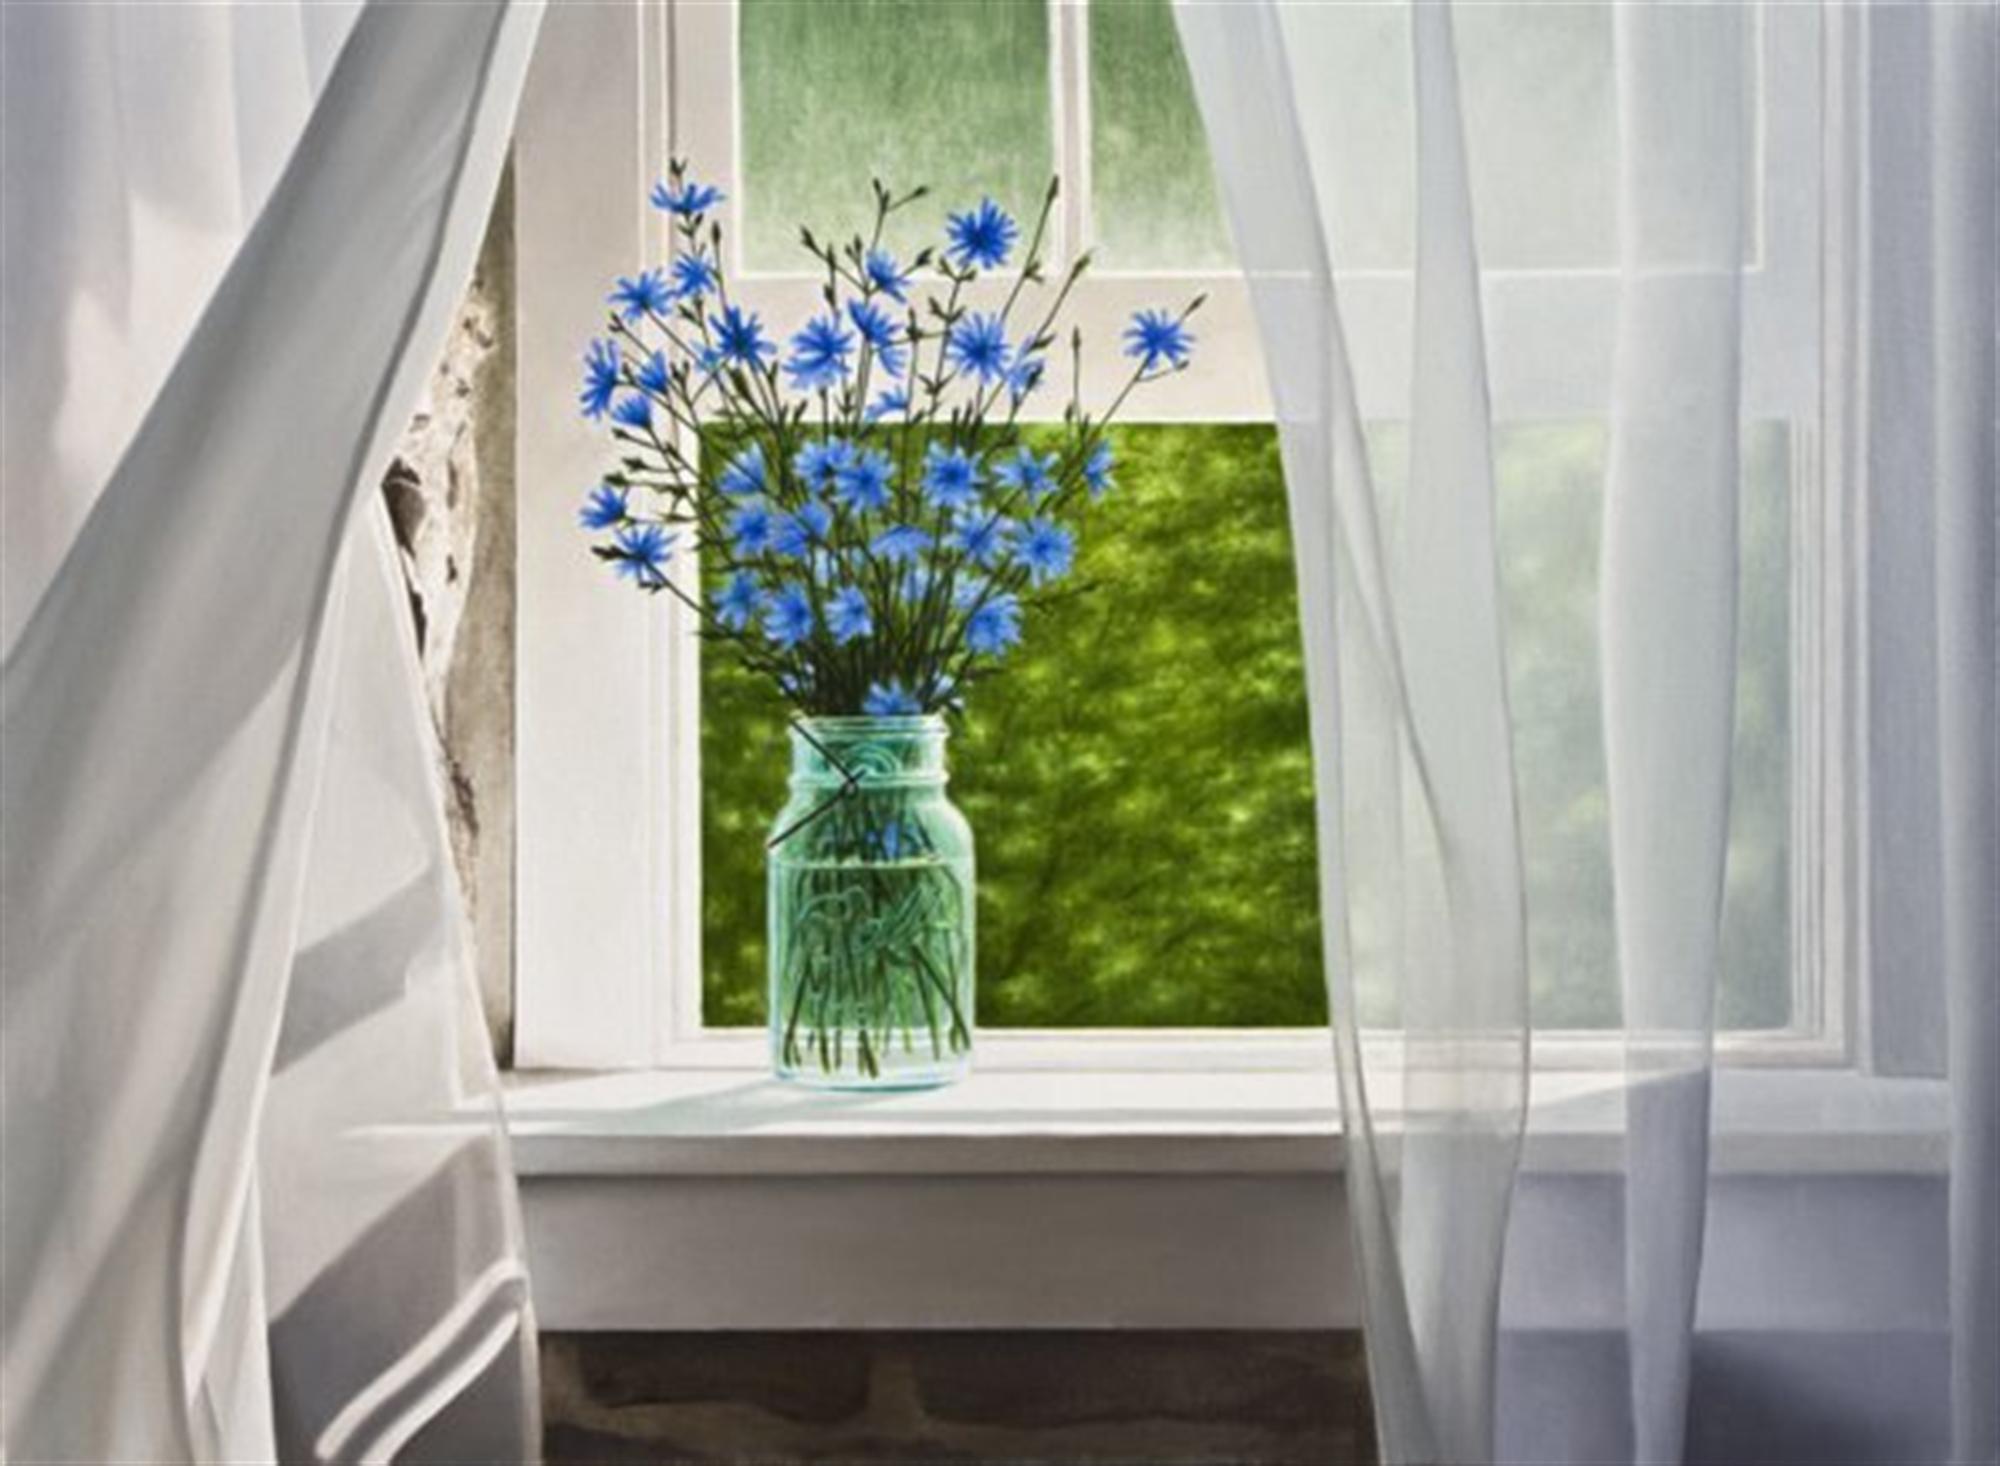 Summer Wind by Alexander Volkov